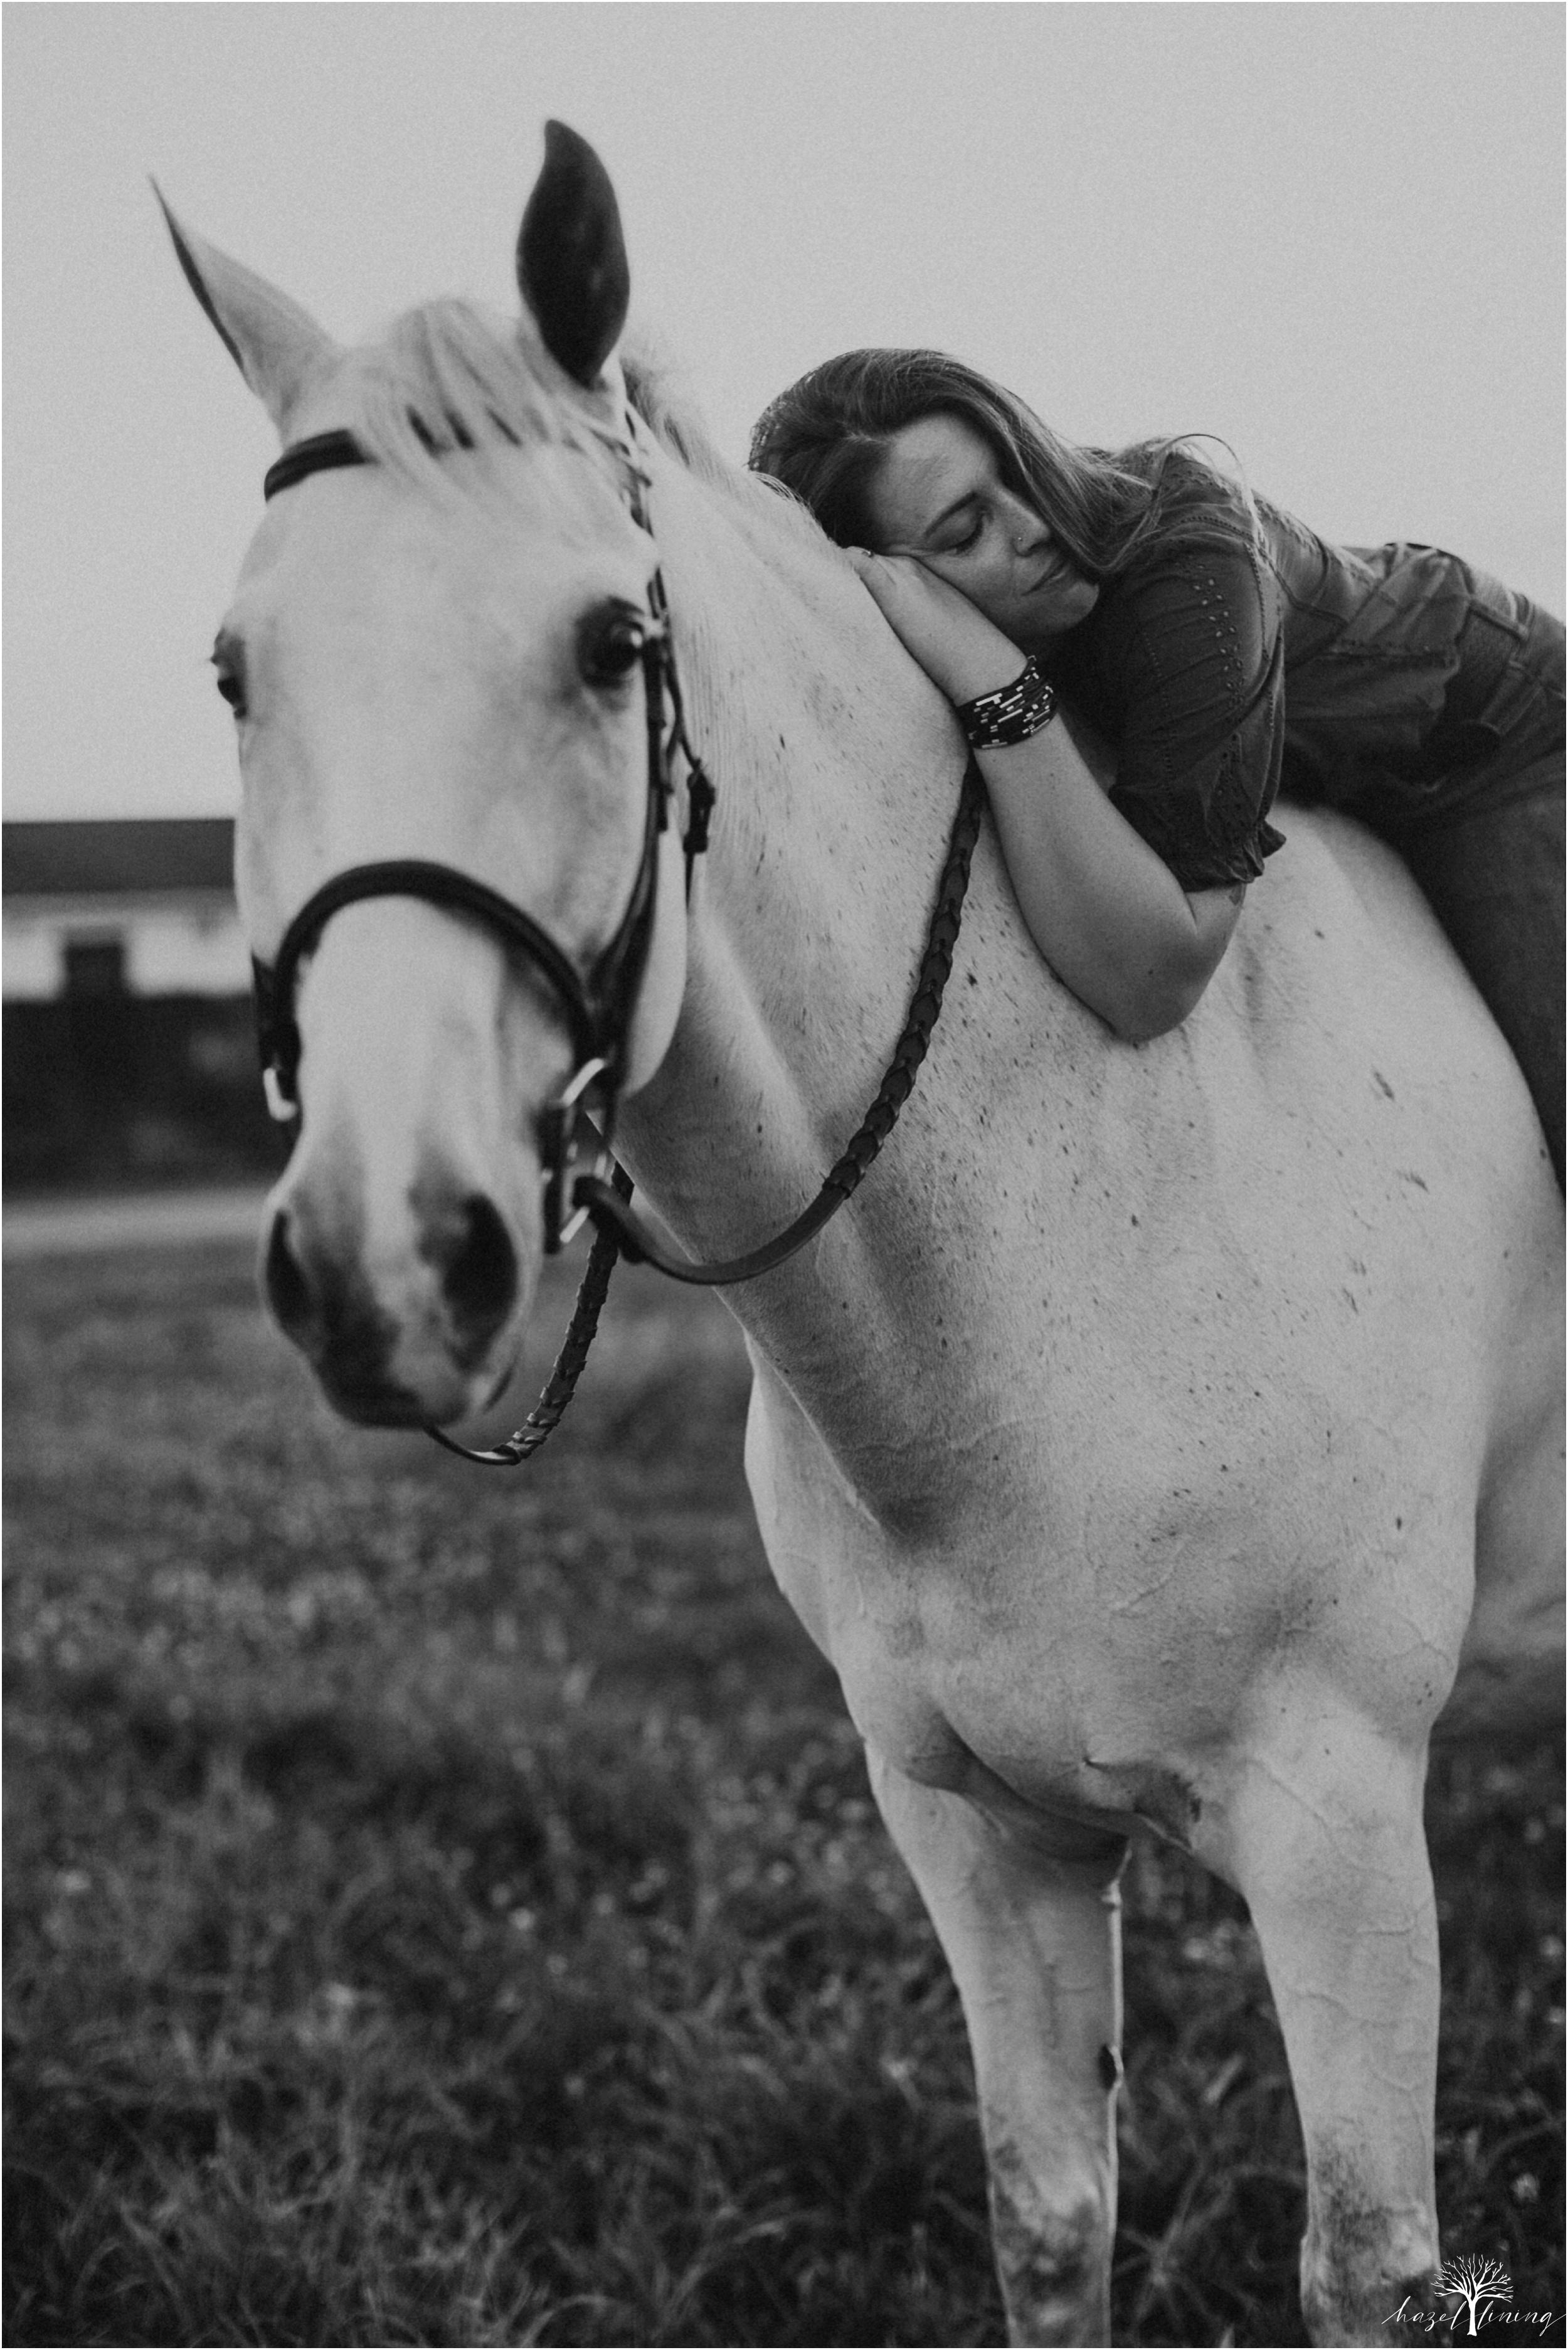 taylor-adams-and-horse-delaware-valley-university-delval-summer-equestrian-portrait-session-hazel-lining-photography-destination-elopement-wedding-engagement-photography_0038.jpg